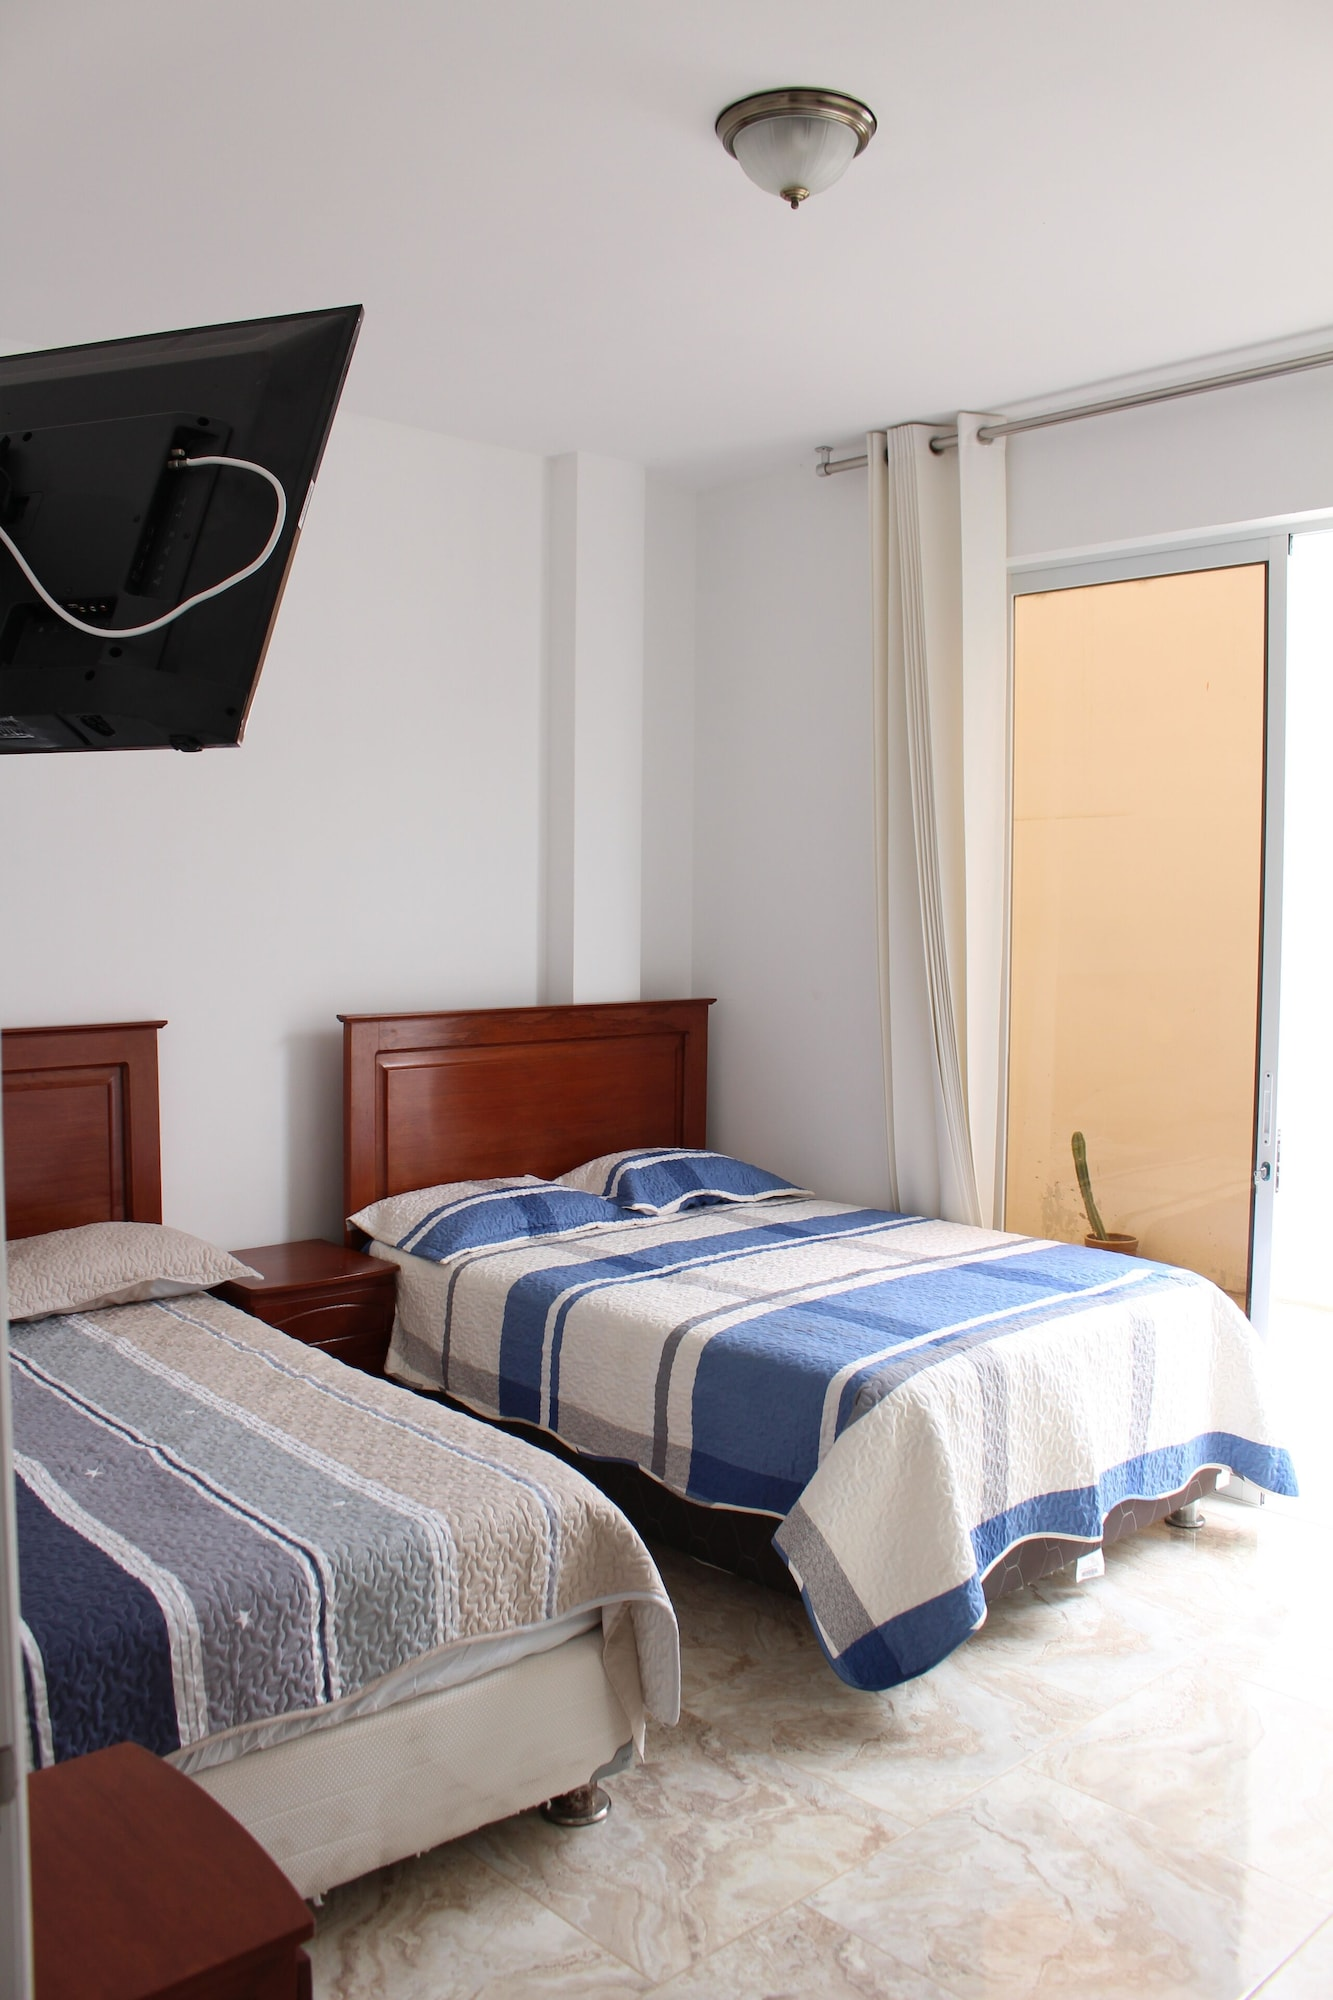 Blanca Rosa's Place Vacation Rentals, Pacasmayo